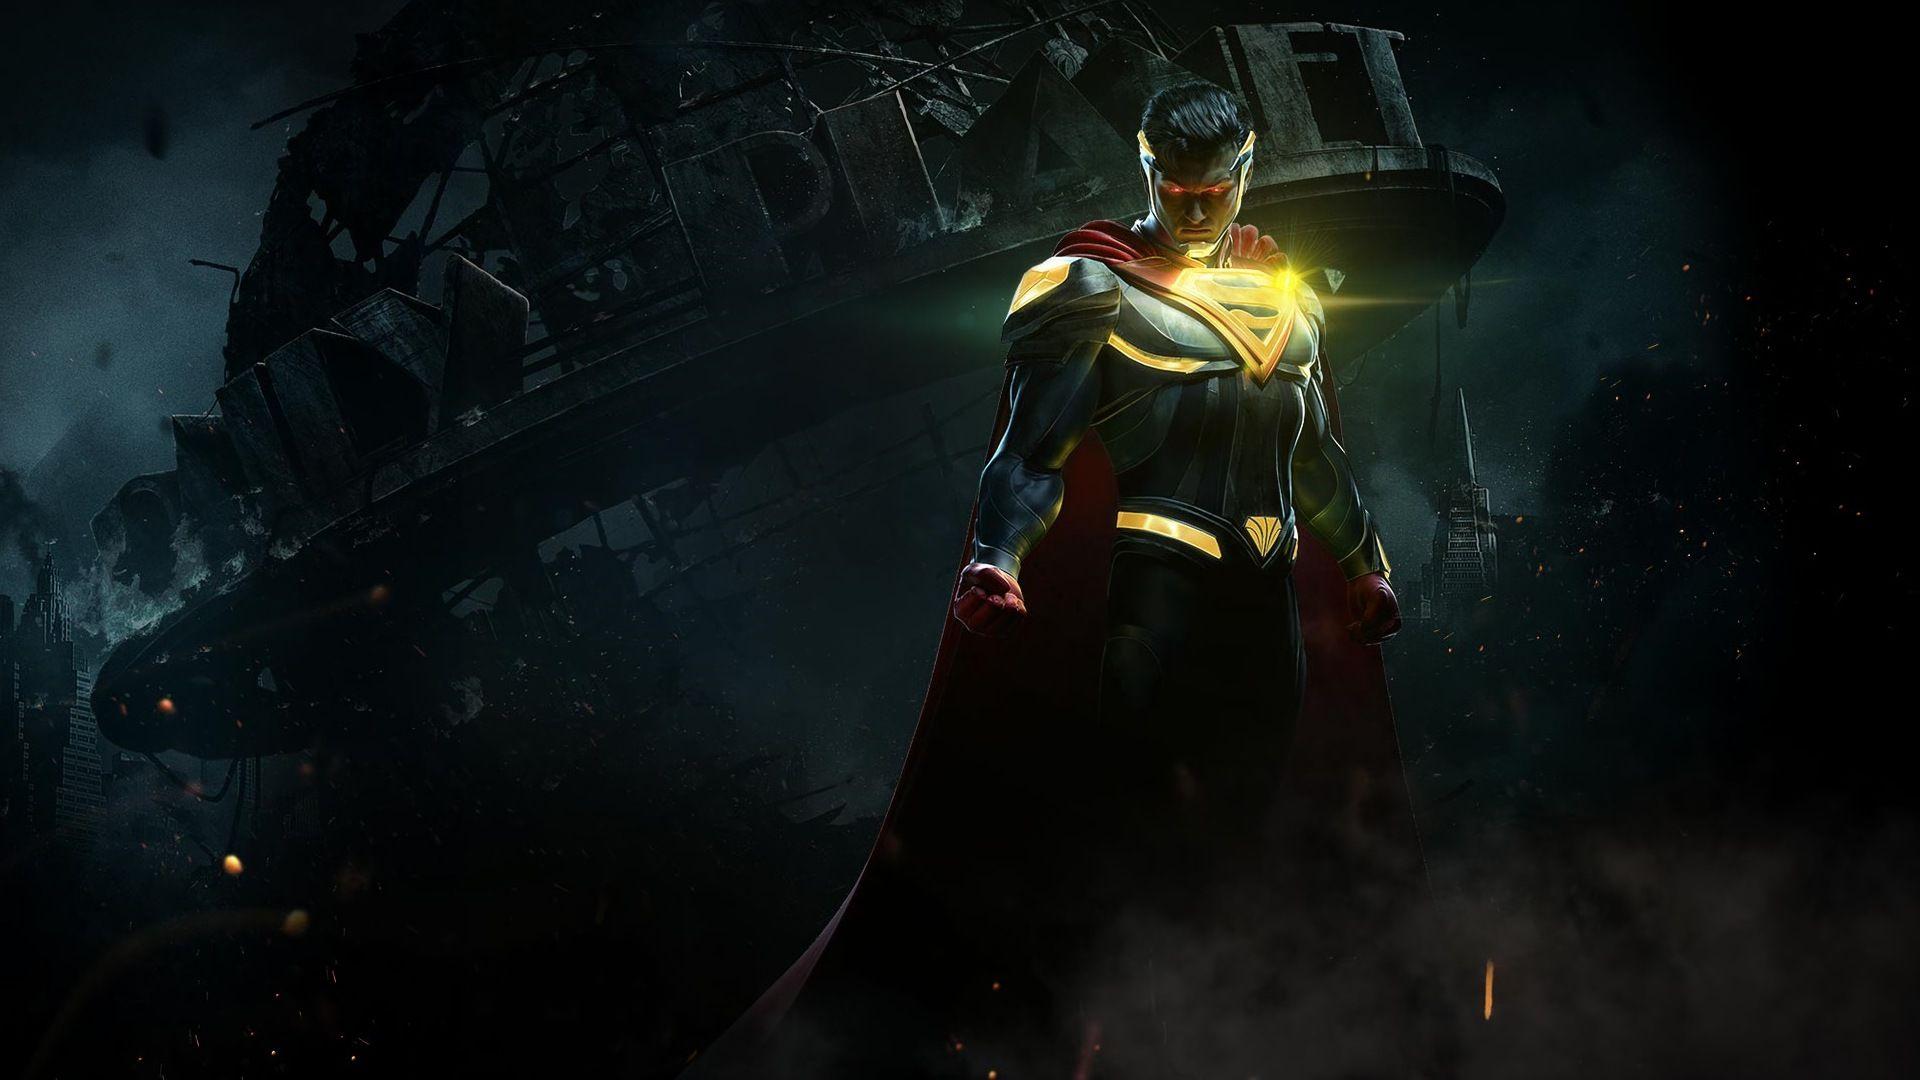 Injustice 2 Superman Hd Games 4k Wallpapers Images: Superman Injustice 2 1920x1080